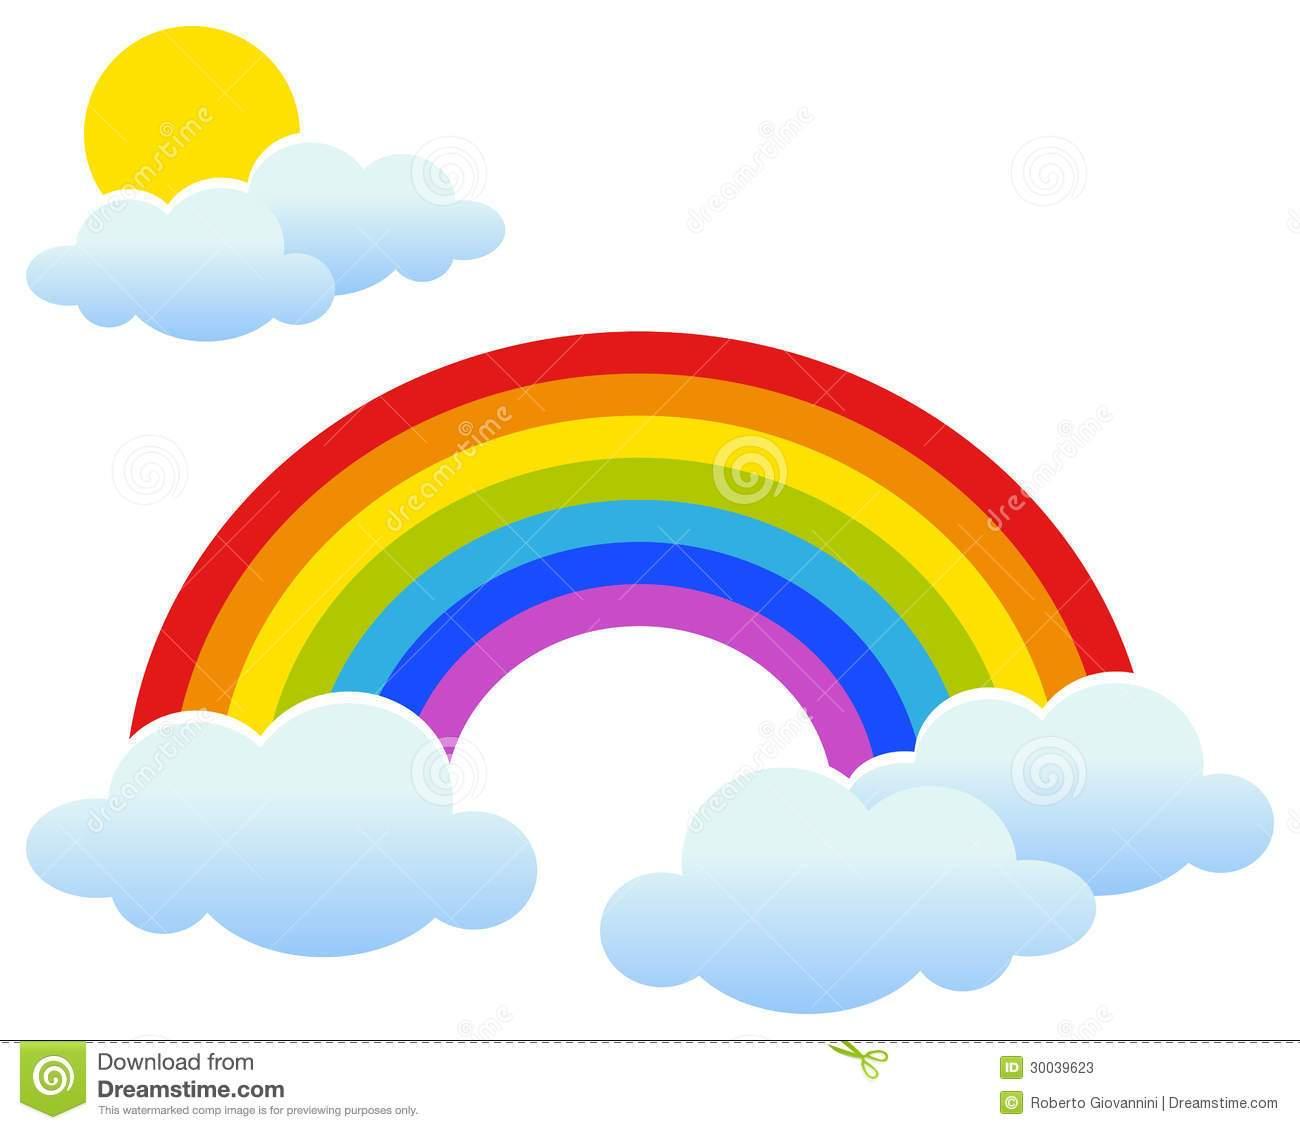 Clipart arcobaleno 6 » Clipart Portal.